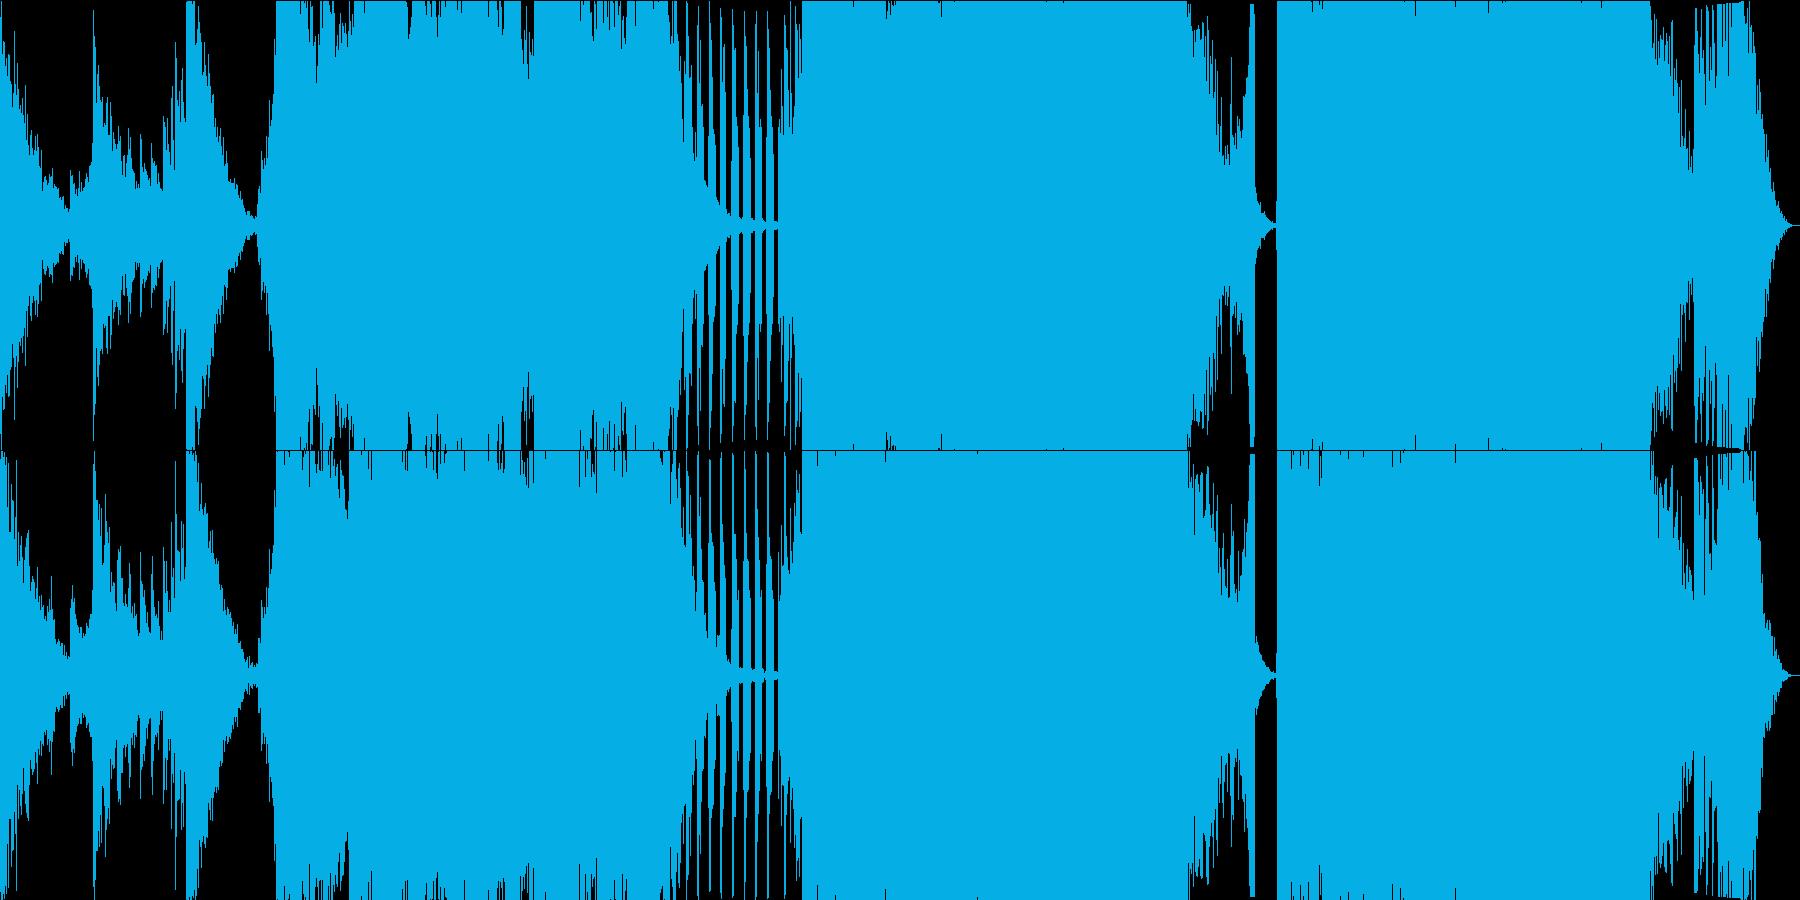 KANTシネマティック絶望と決意FULLの再生済みの波形